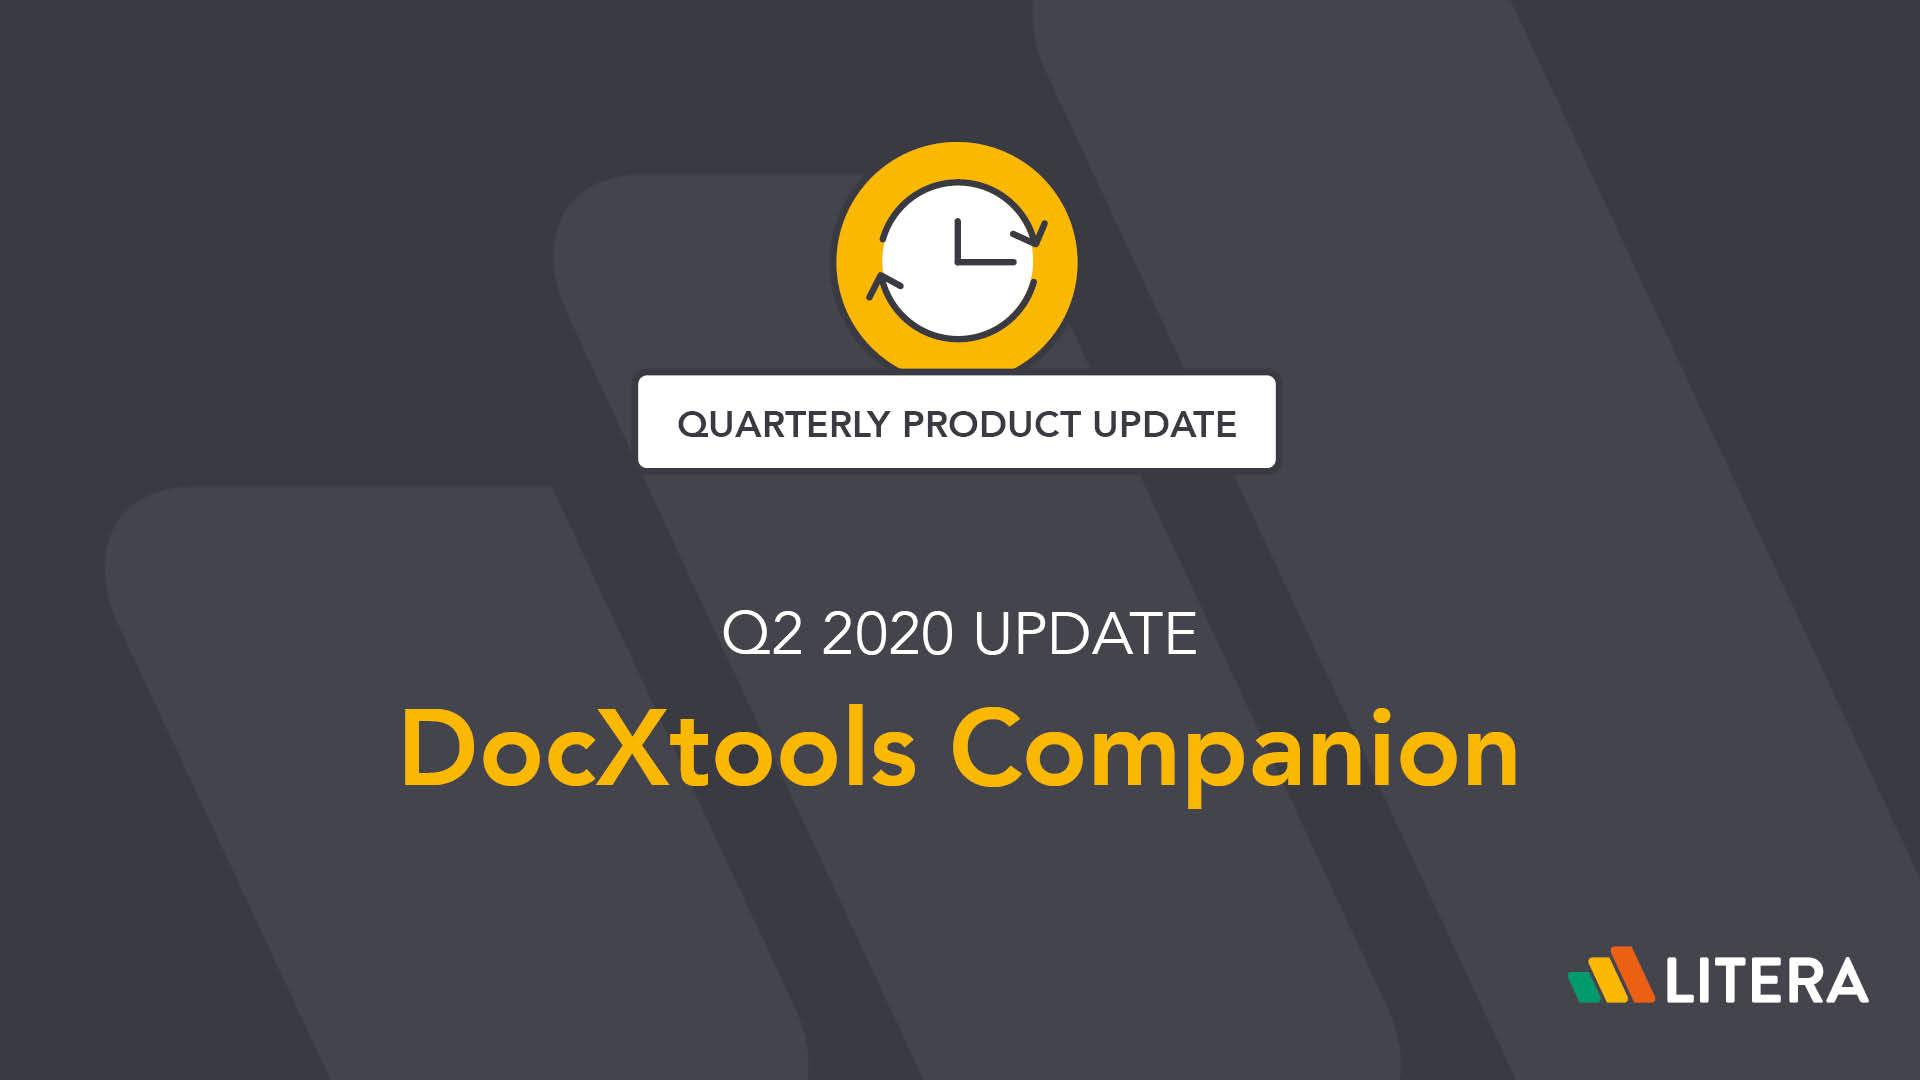 DocXtools Companion v11.7 by Litera